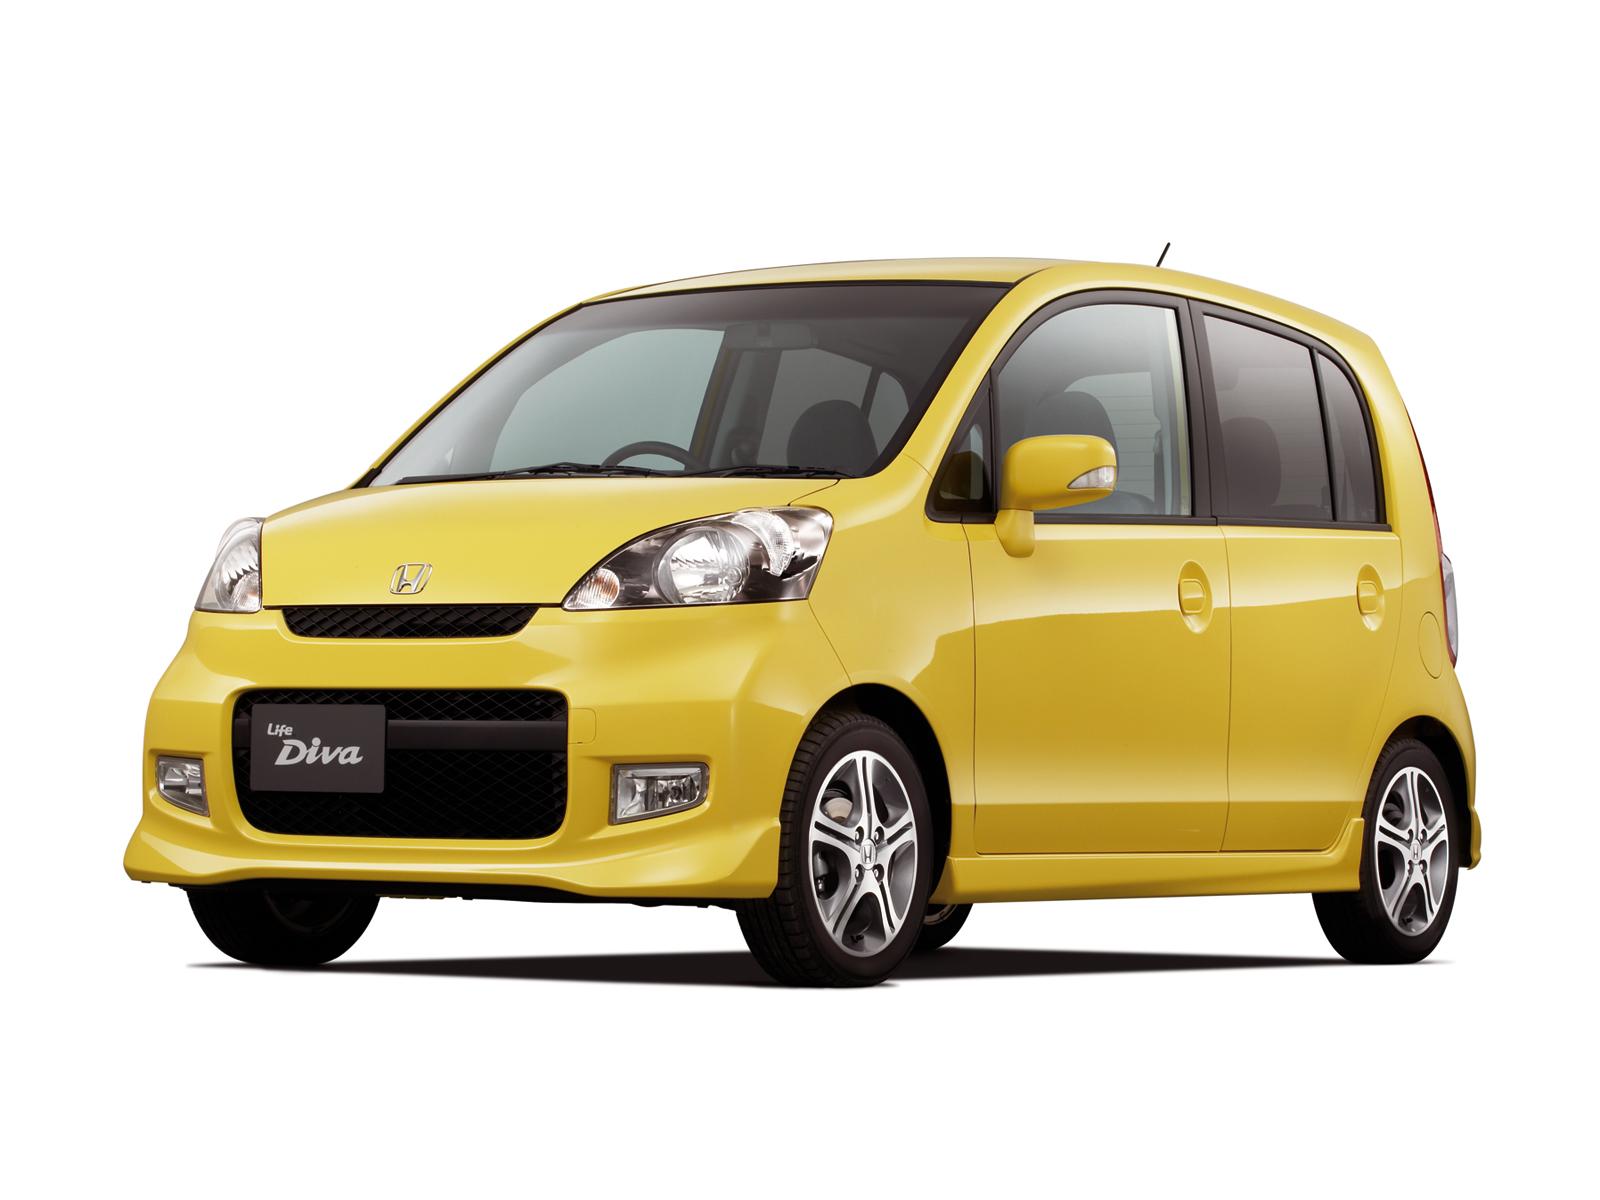 Honda Life 5 дв. минивэн Life